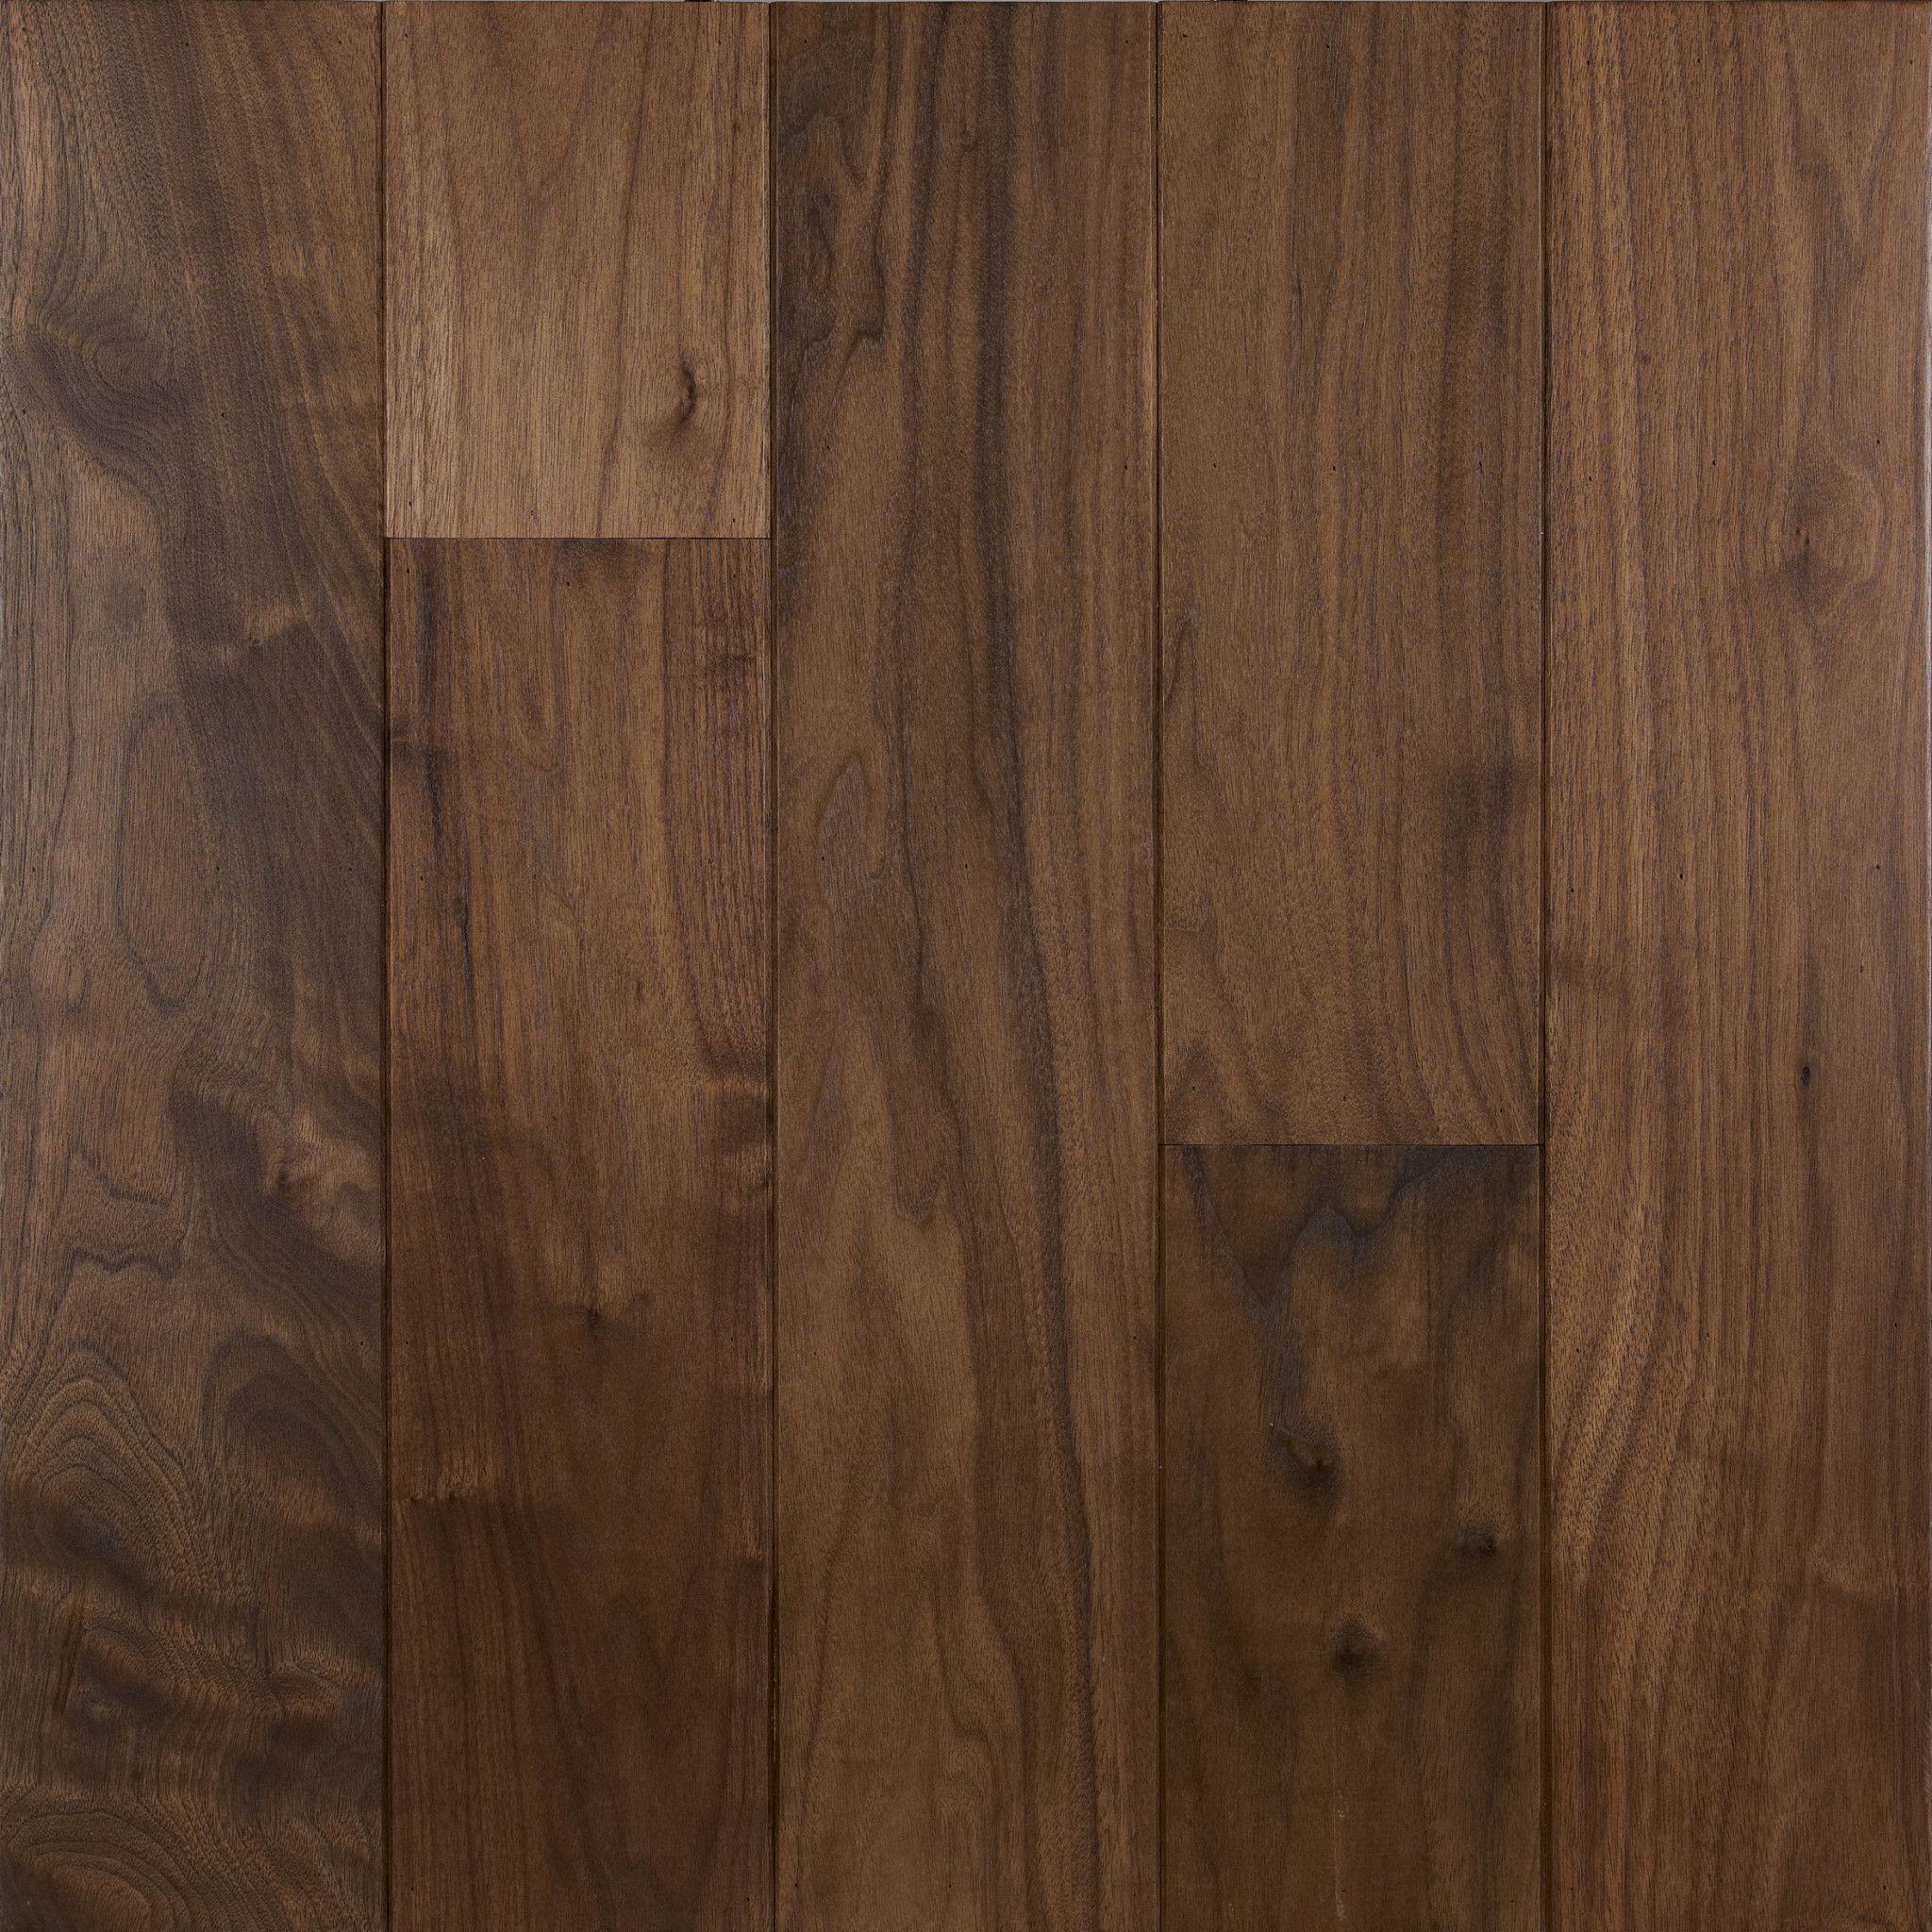 Prefinished American Walnut Natural 3 4 X3 1 4 Belmont